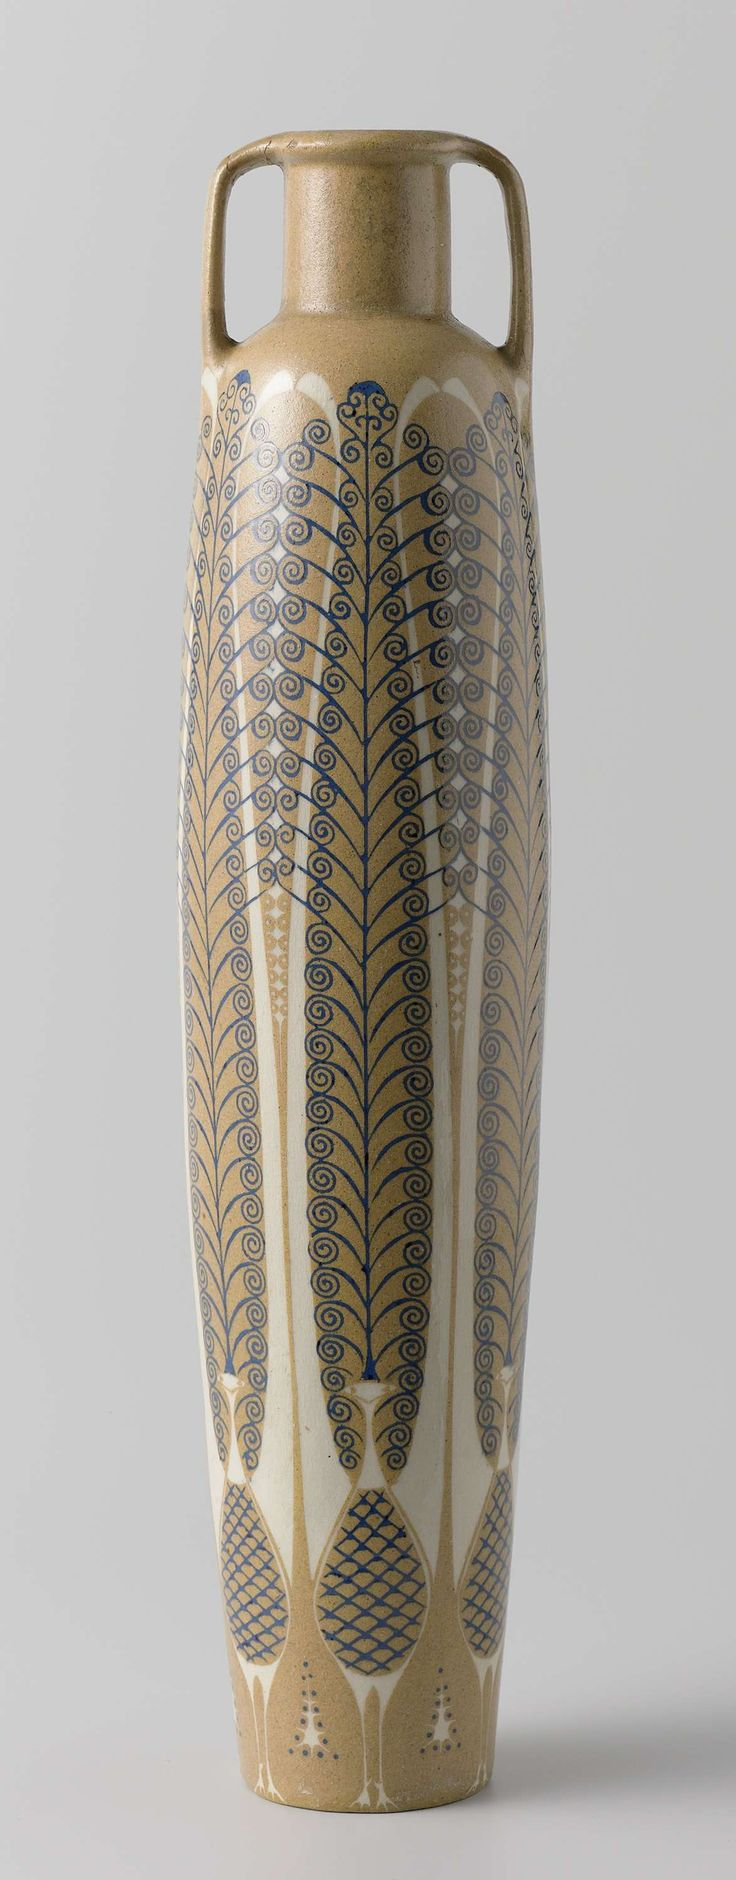 Cilindervormige vaas met gestileerde liervogels in wit en blauw op geelbruine fond, Chris van der Hoef, 1902